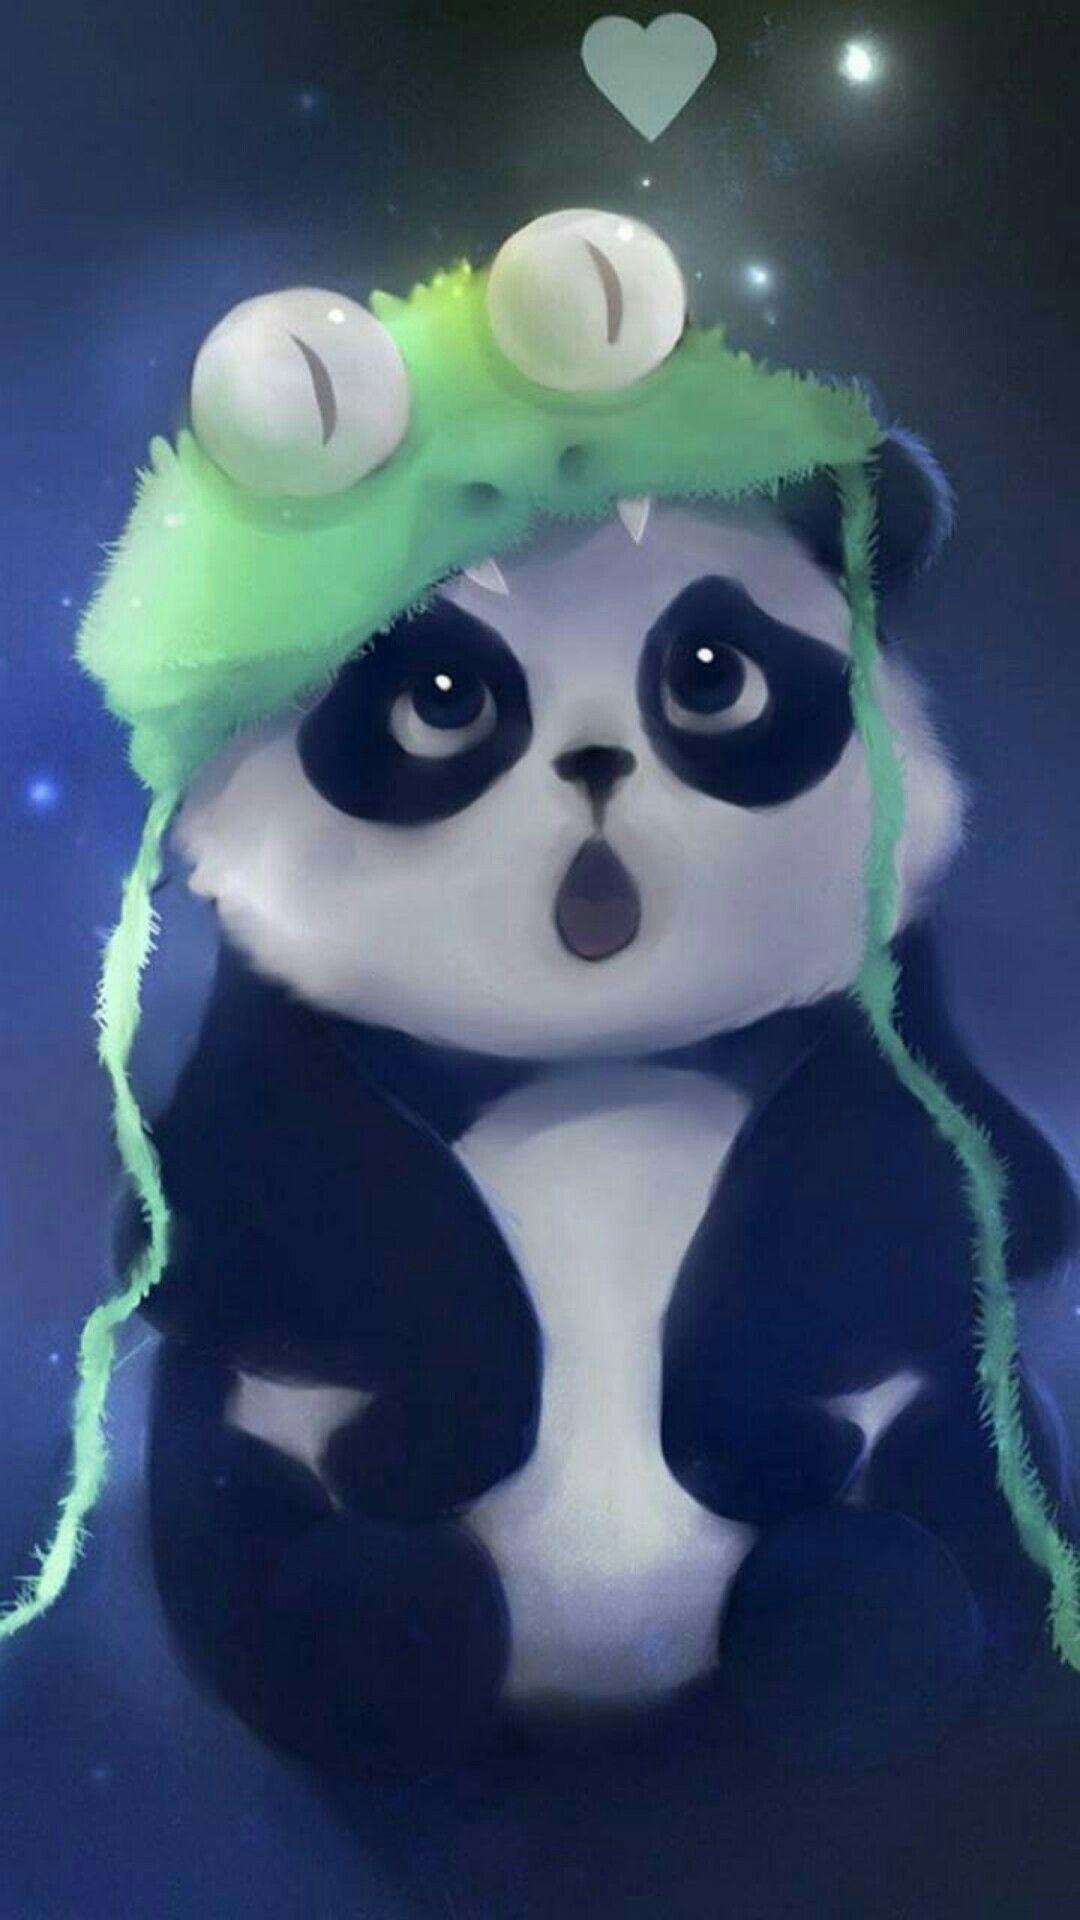 Pin By Claudine Owens On Panda In 2019 Cute Panda Wallpaper Panda